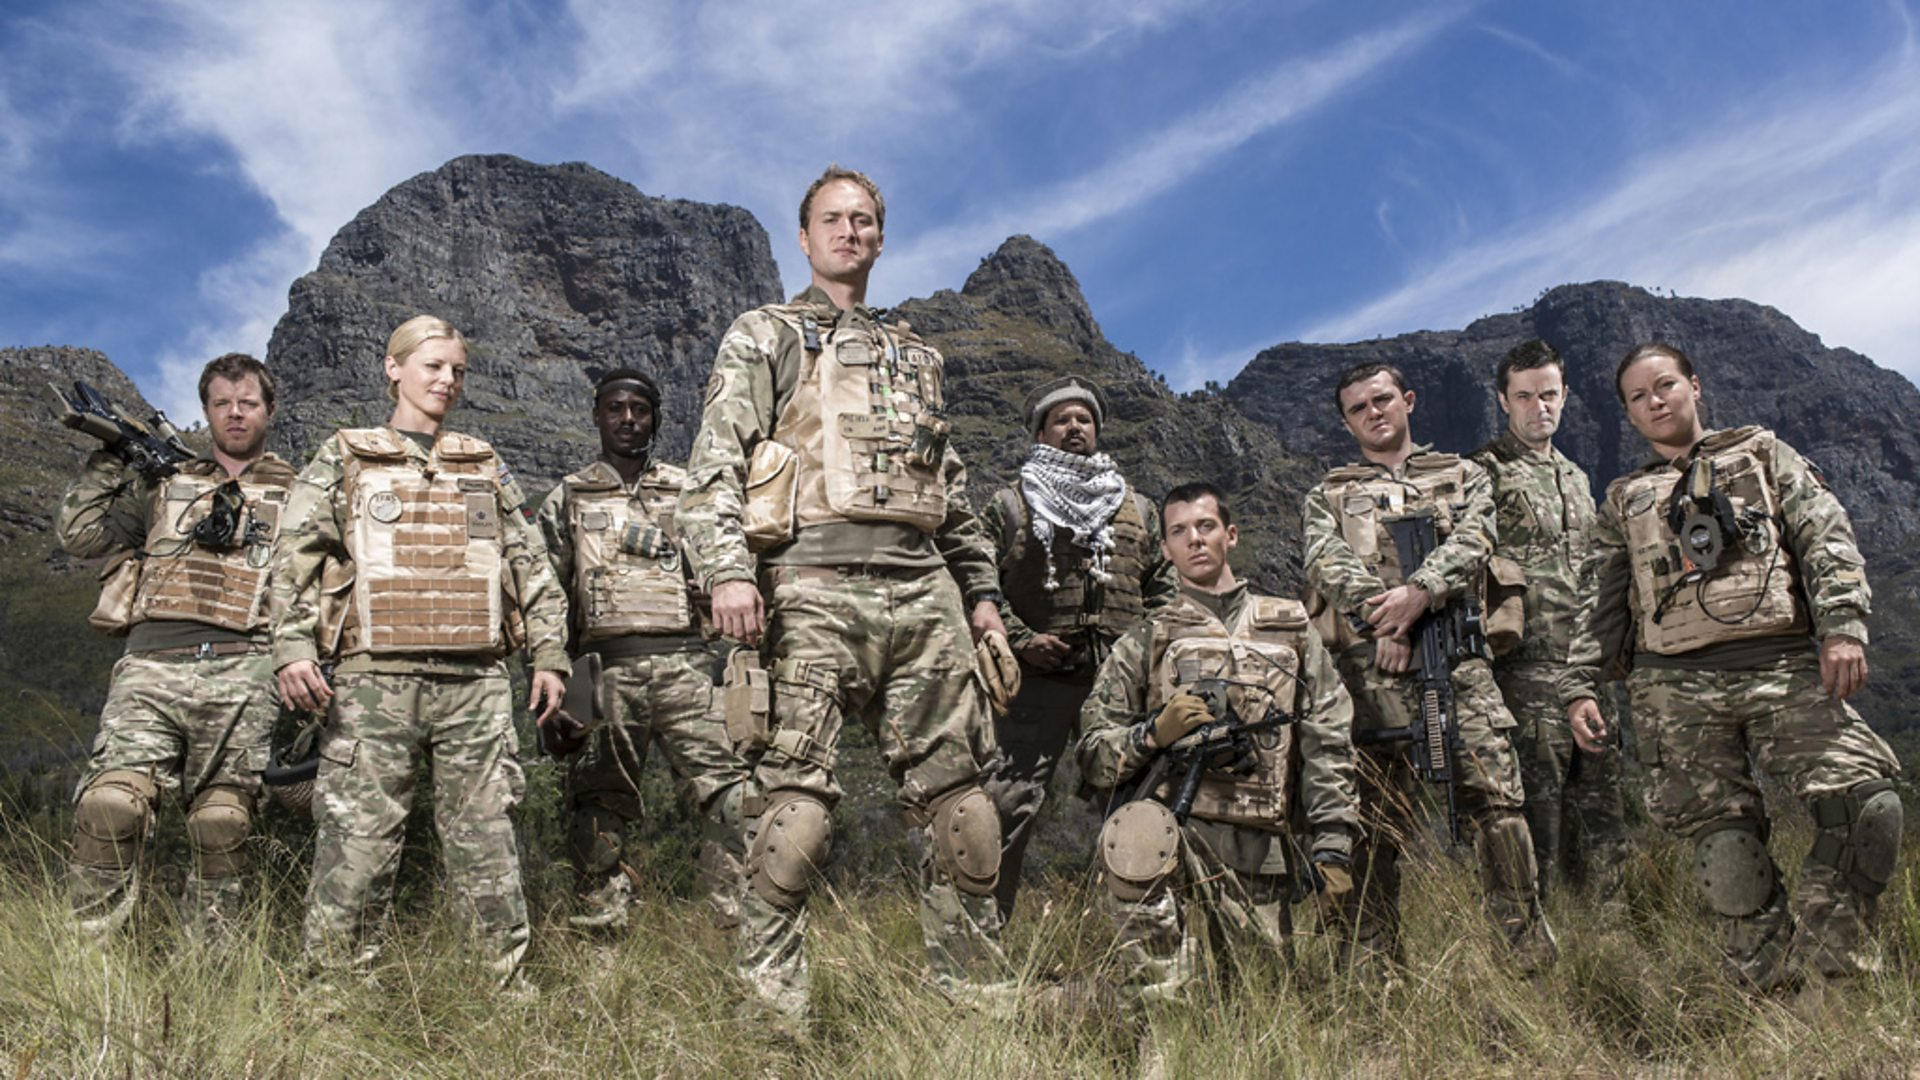 BBC Three - Bluestone 42, Series 1 - Armyspeak